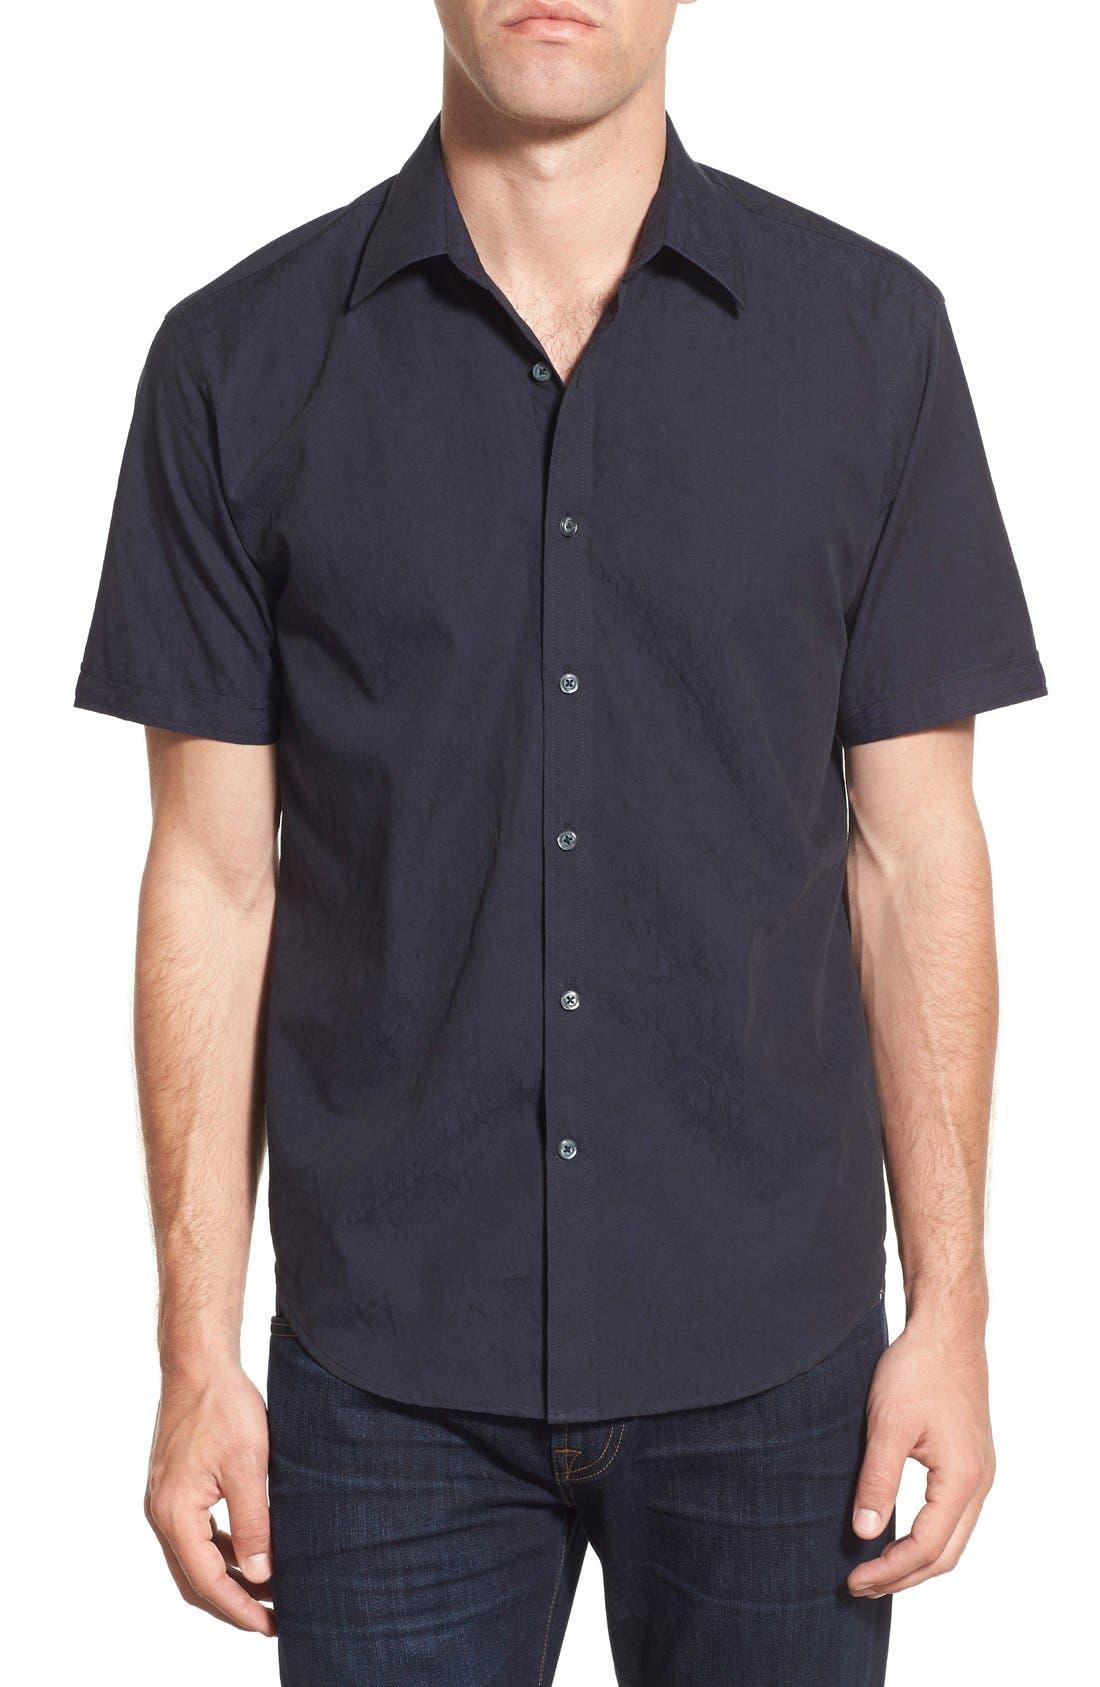 James Campbell 'Rabaul' Regular Fit Swirl Jacquard Short Sleeve Sport Shirt